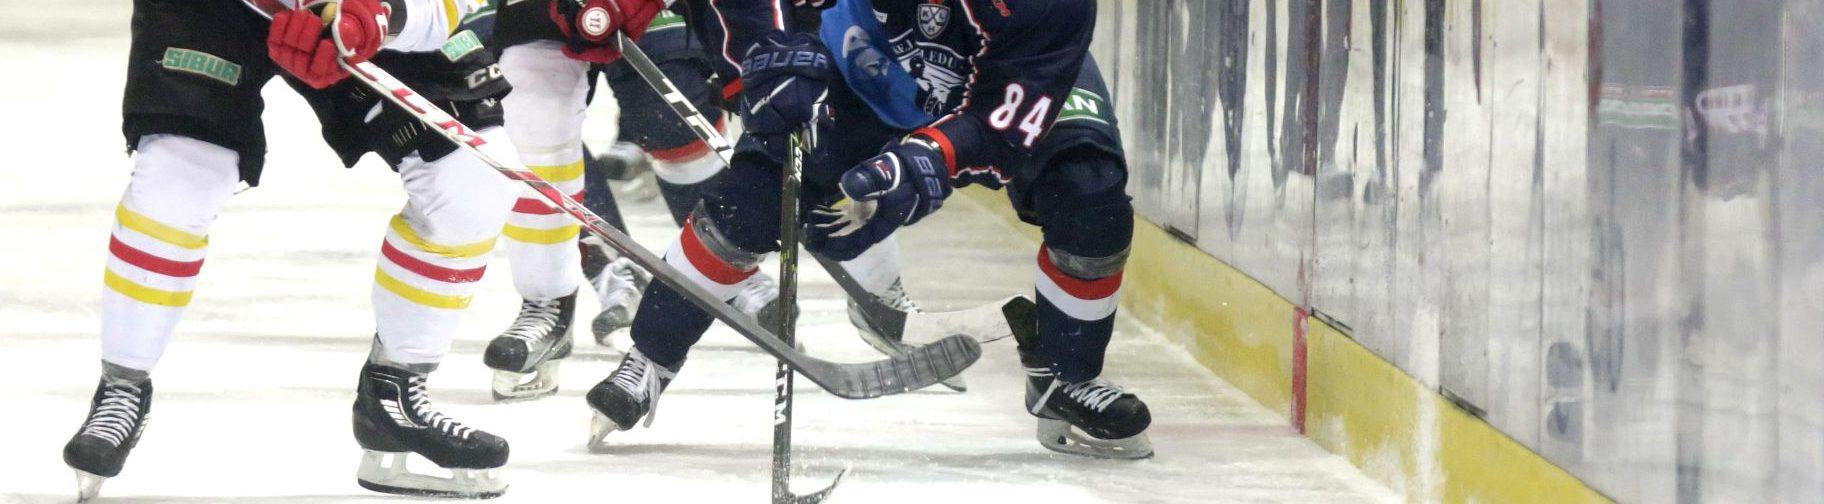 KHL: Kunlun RS – Medveščak 5-0